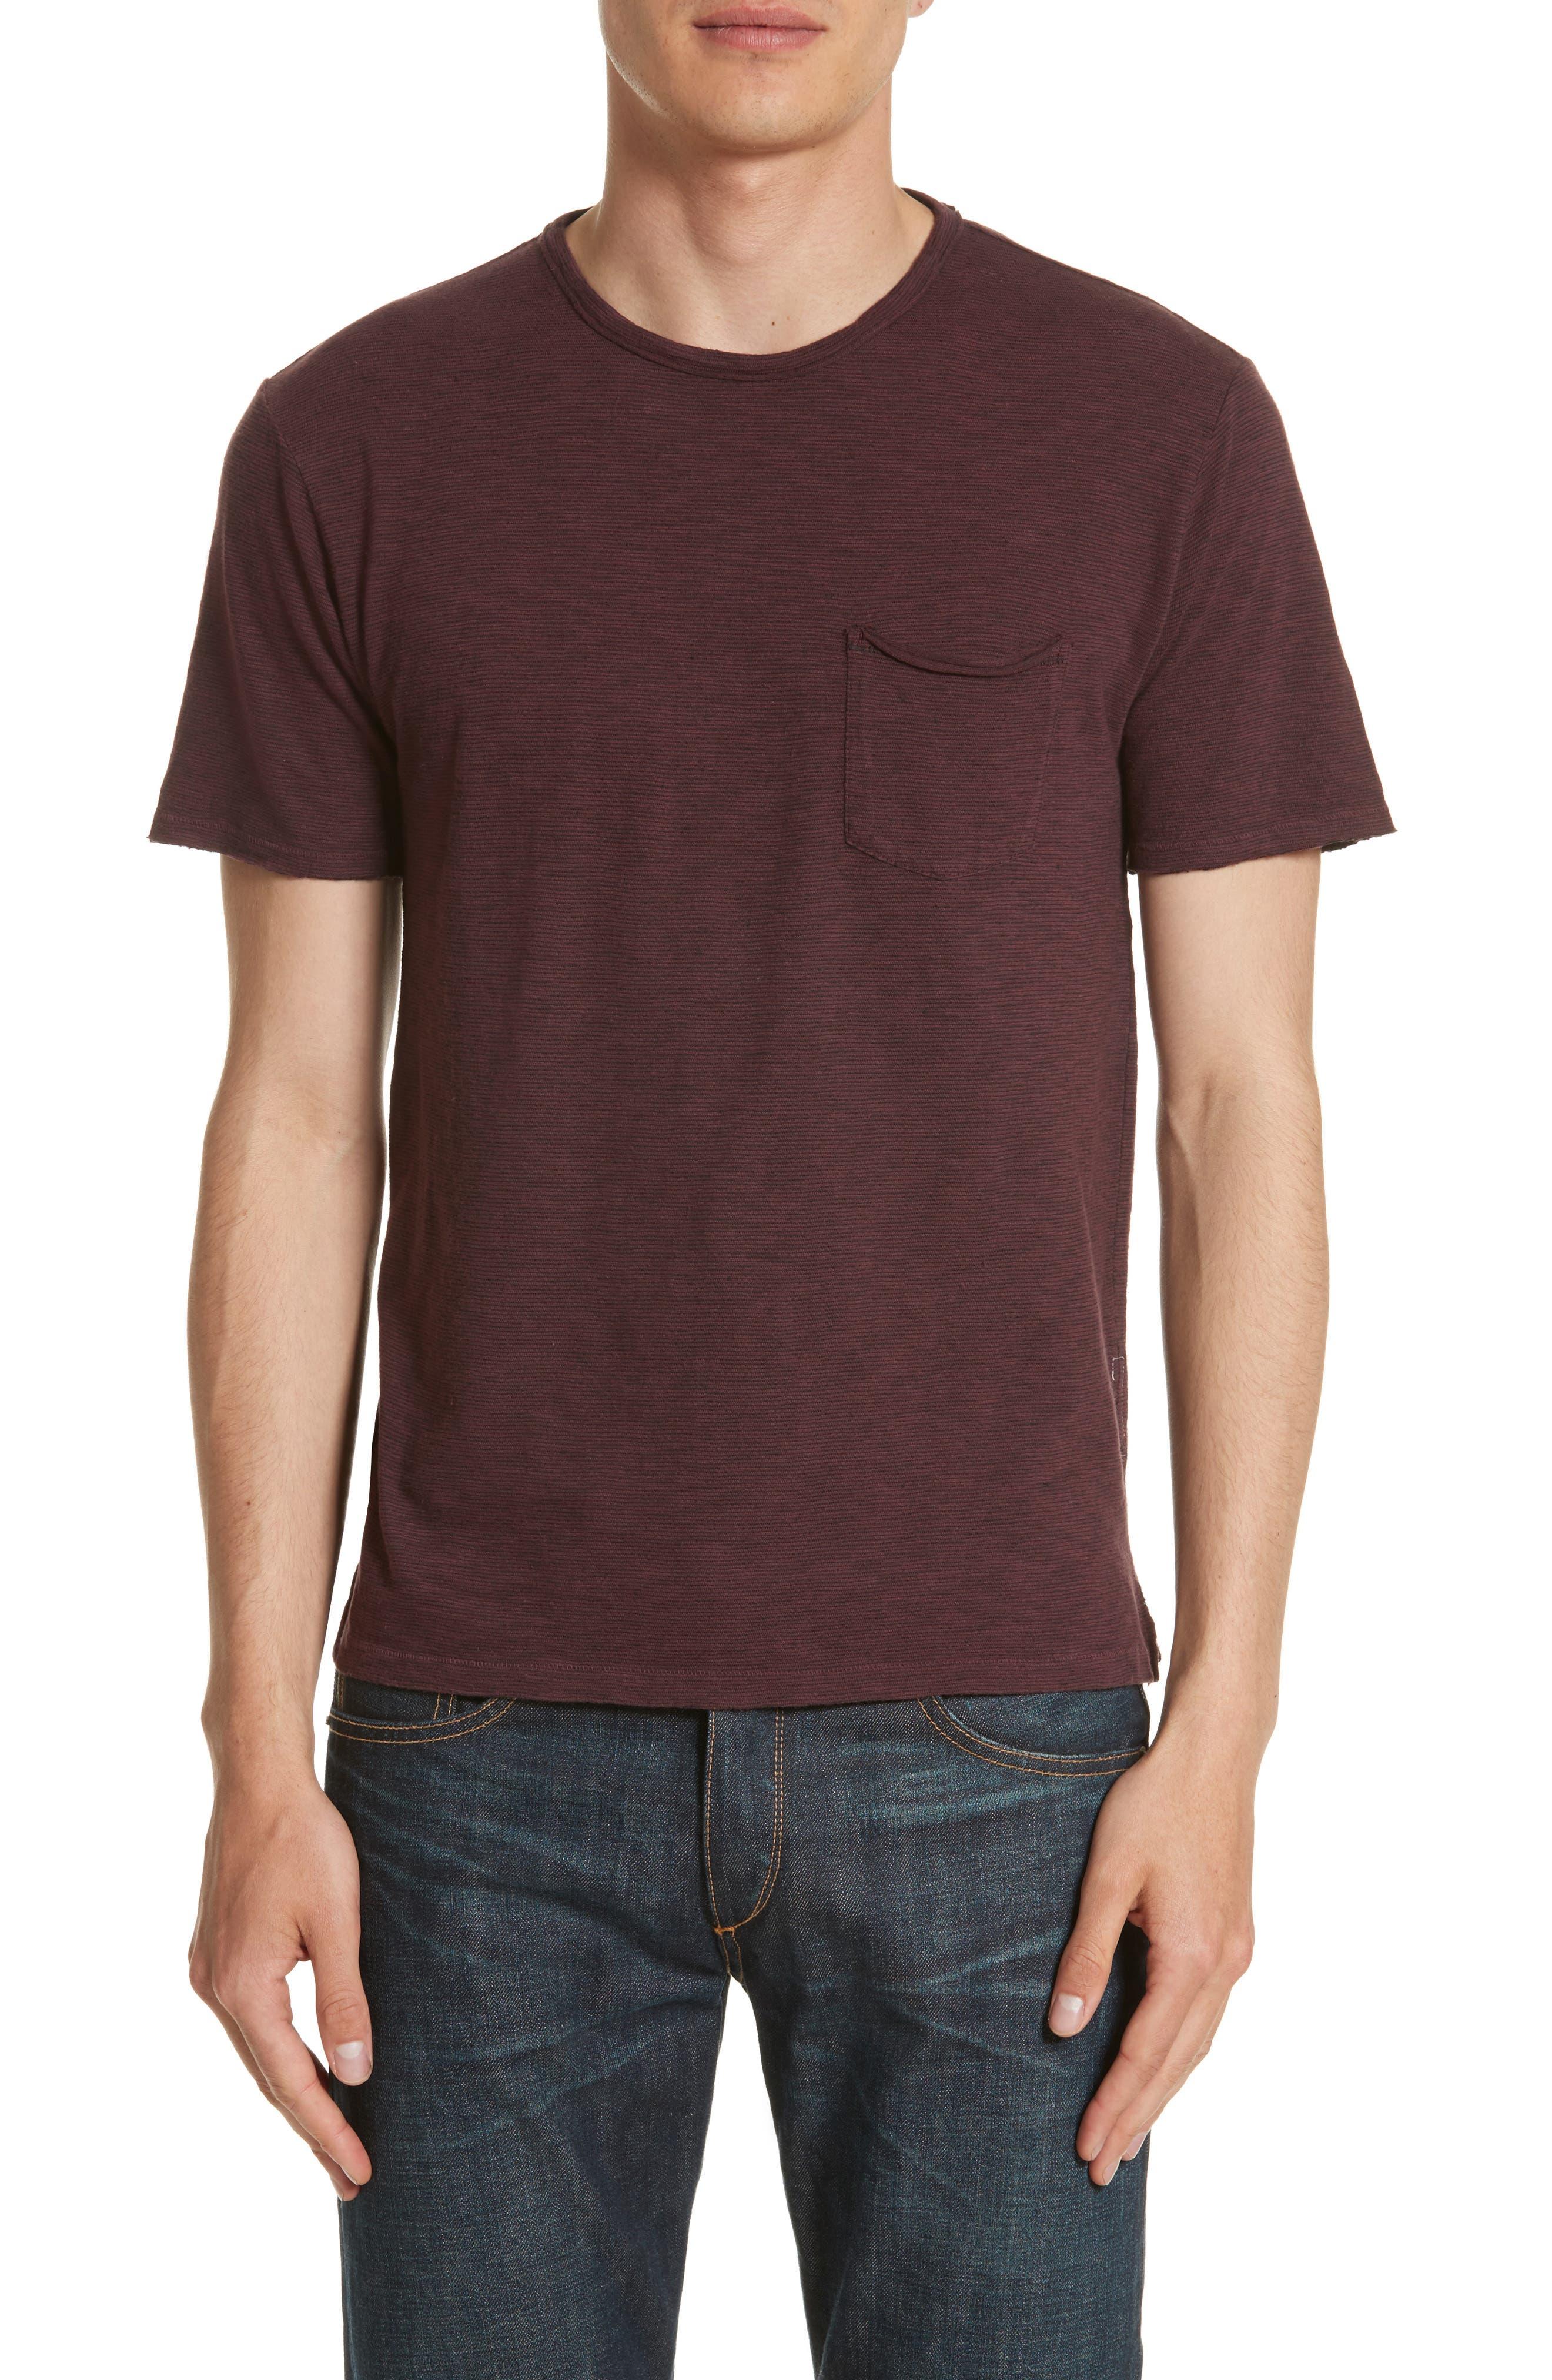 Alternate Image 1 Selected - rag & bone Owen Pocket T-Shirt